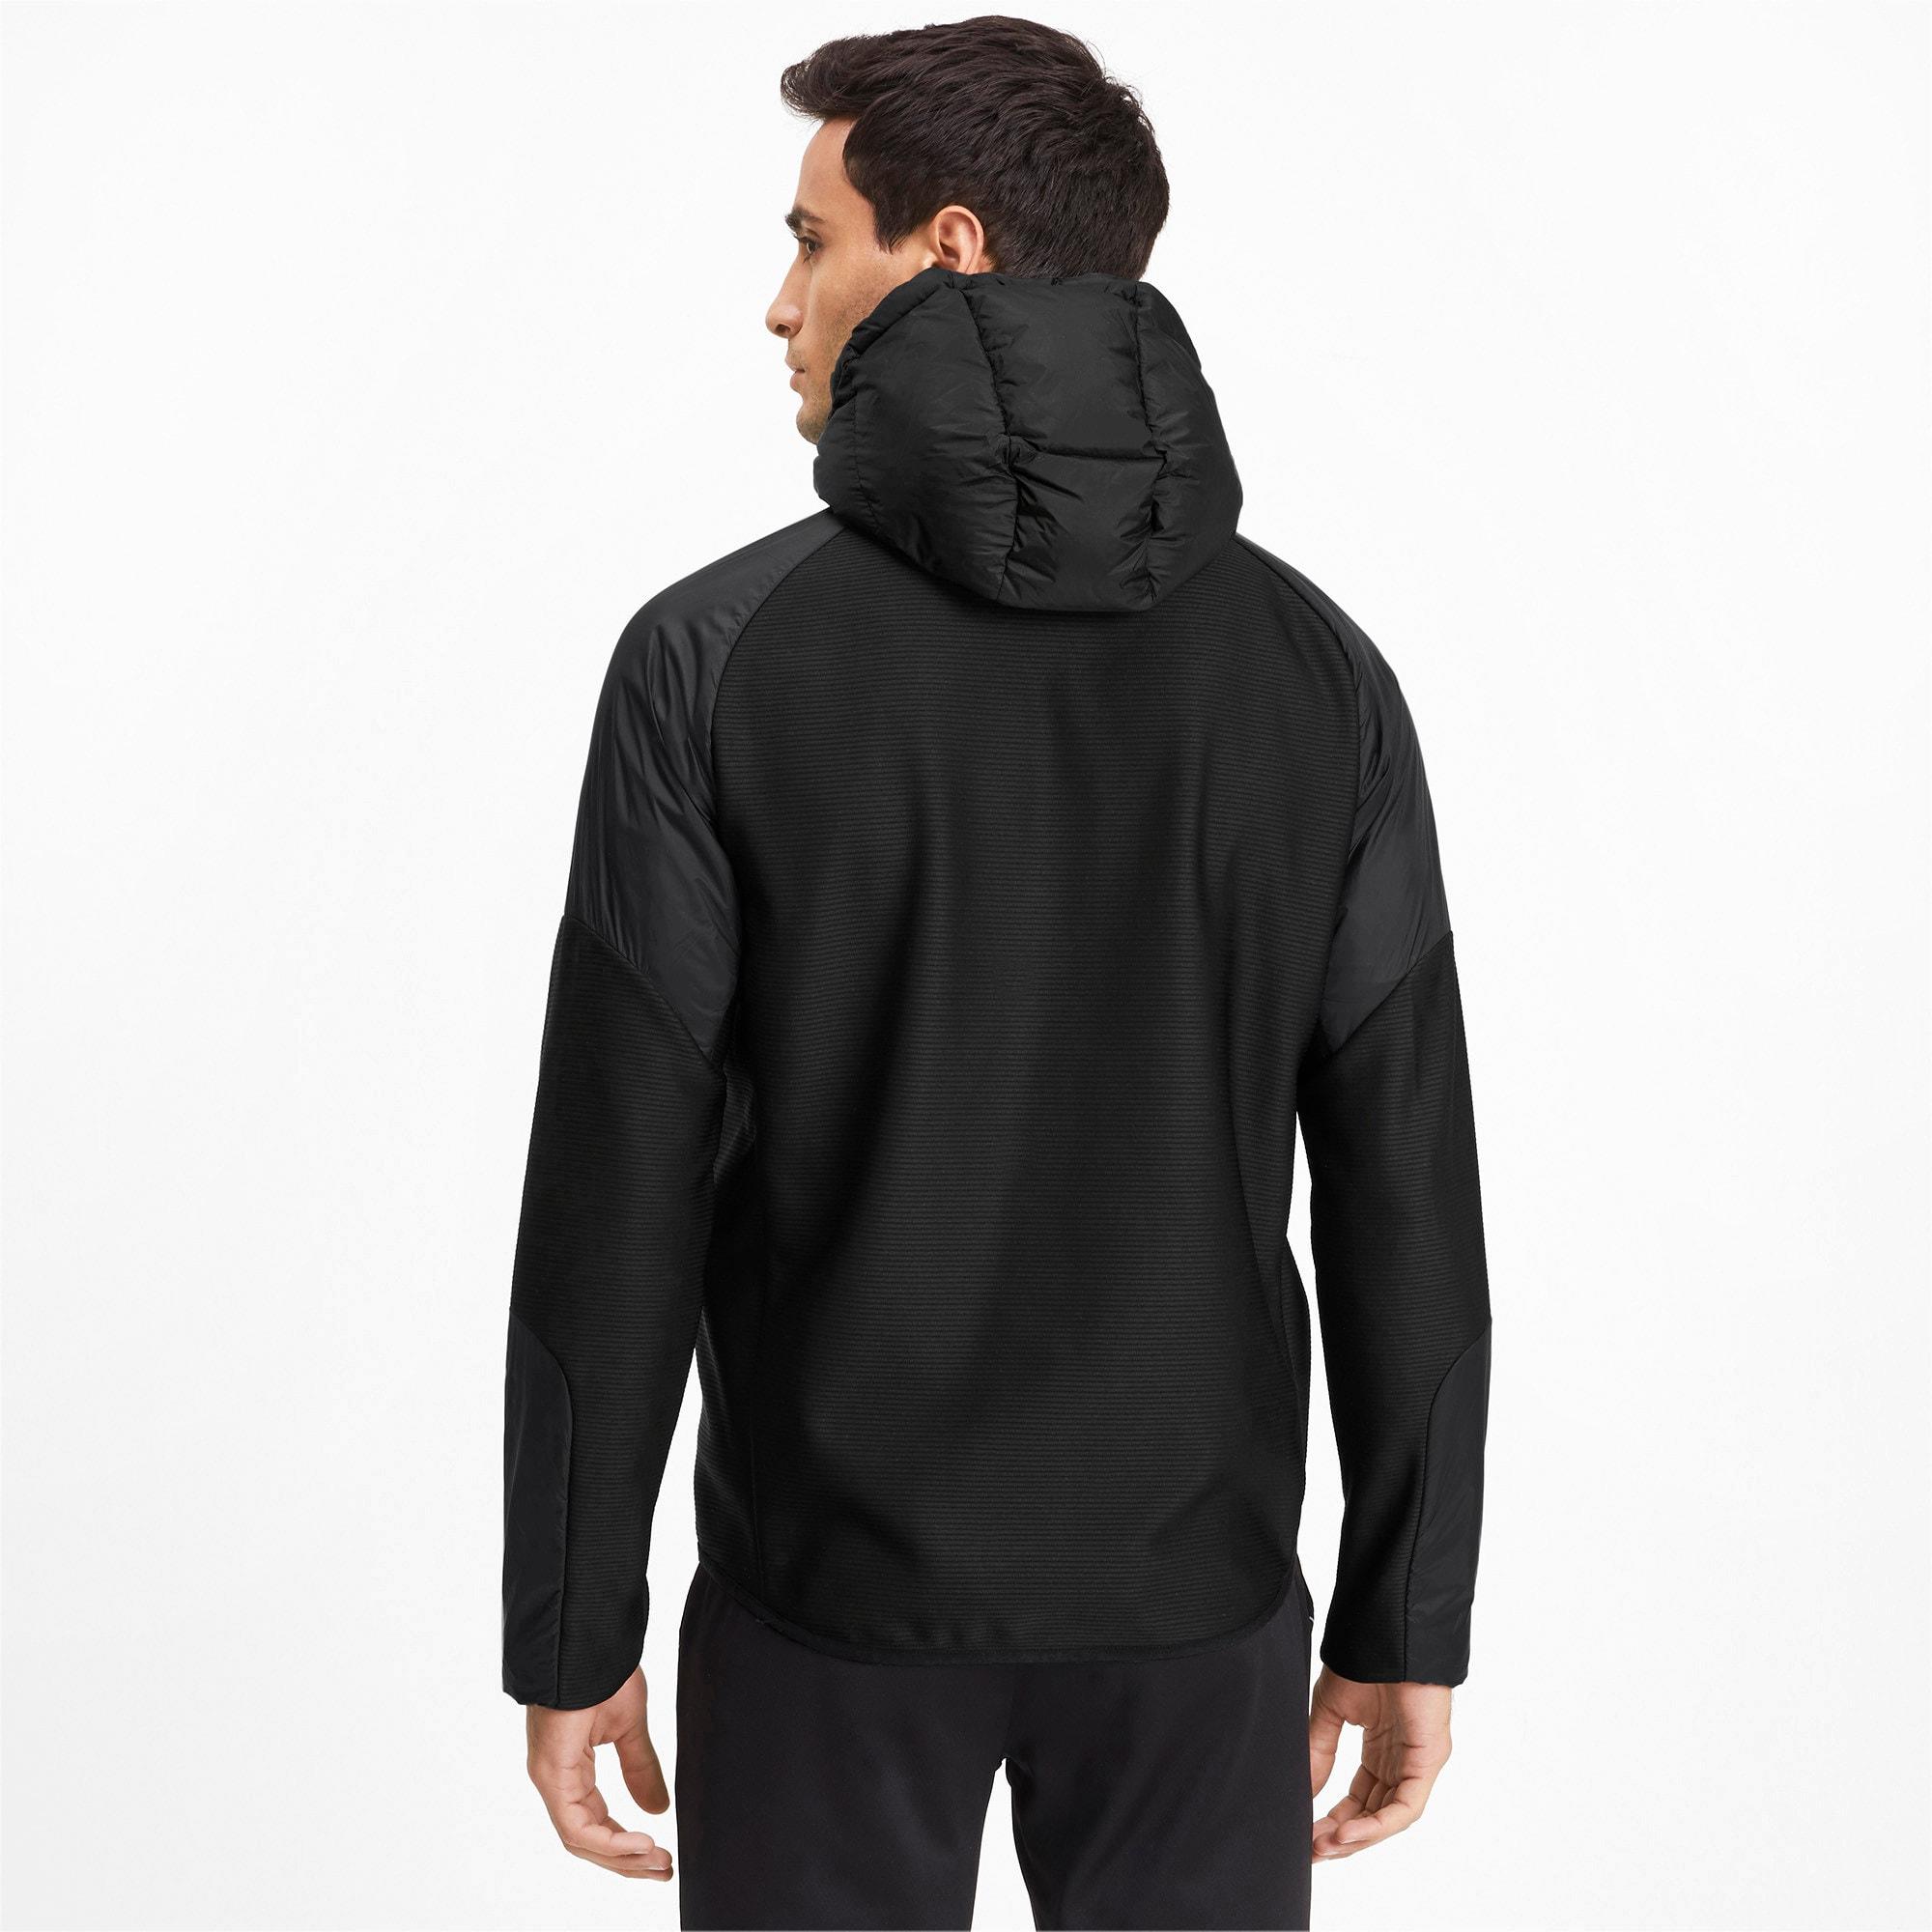 Thumbnail 2 of 600 Hybrid Down Men's Jacket, Puma Black, medium